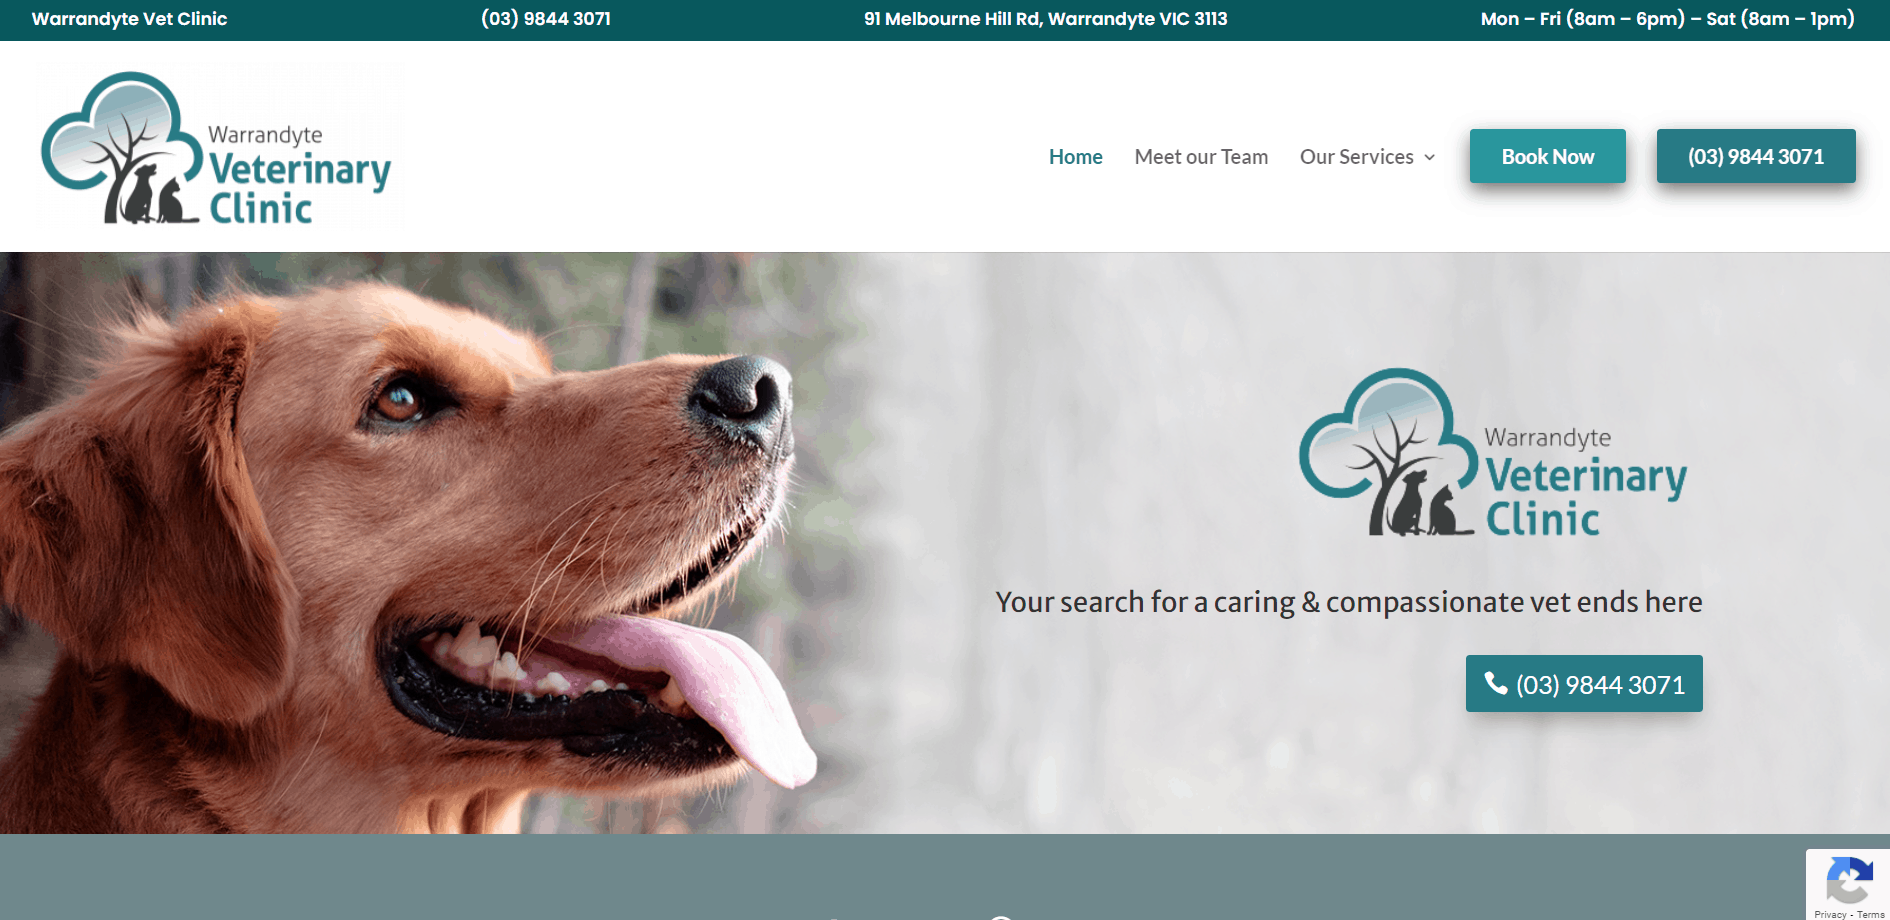 Warrandyte Veterinary Clinic